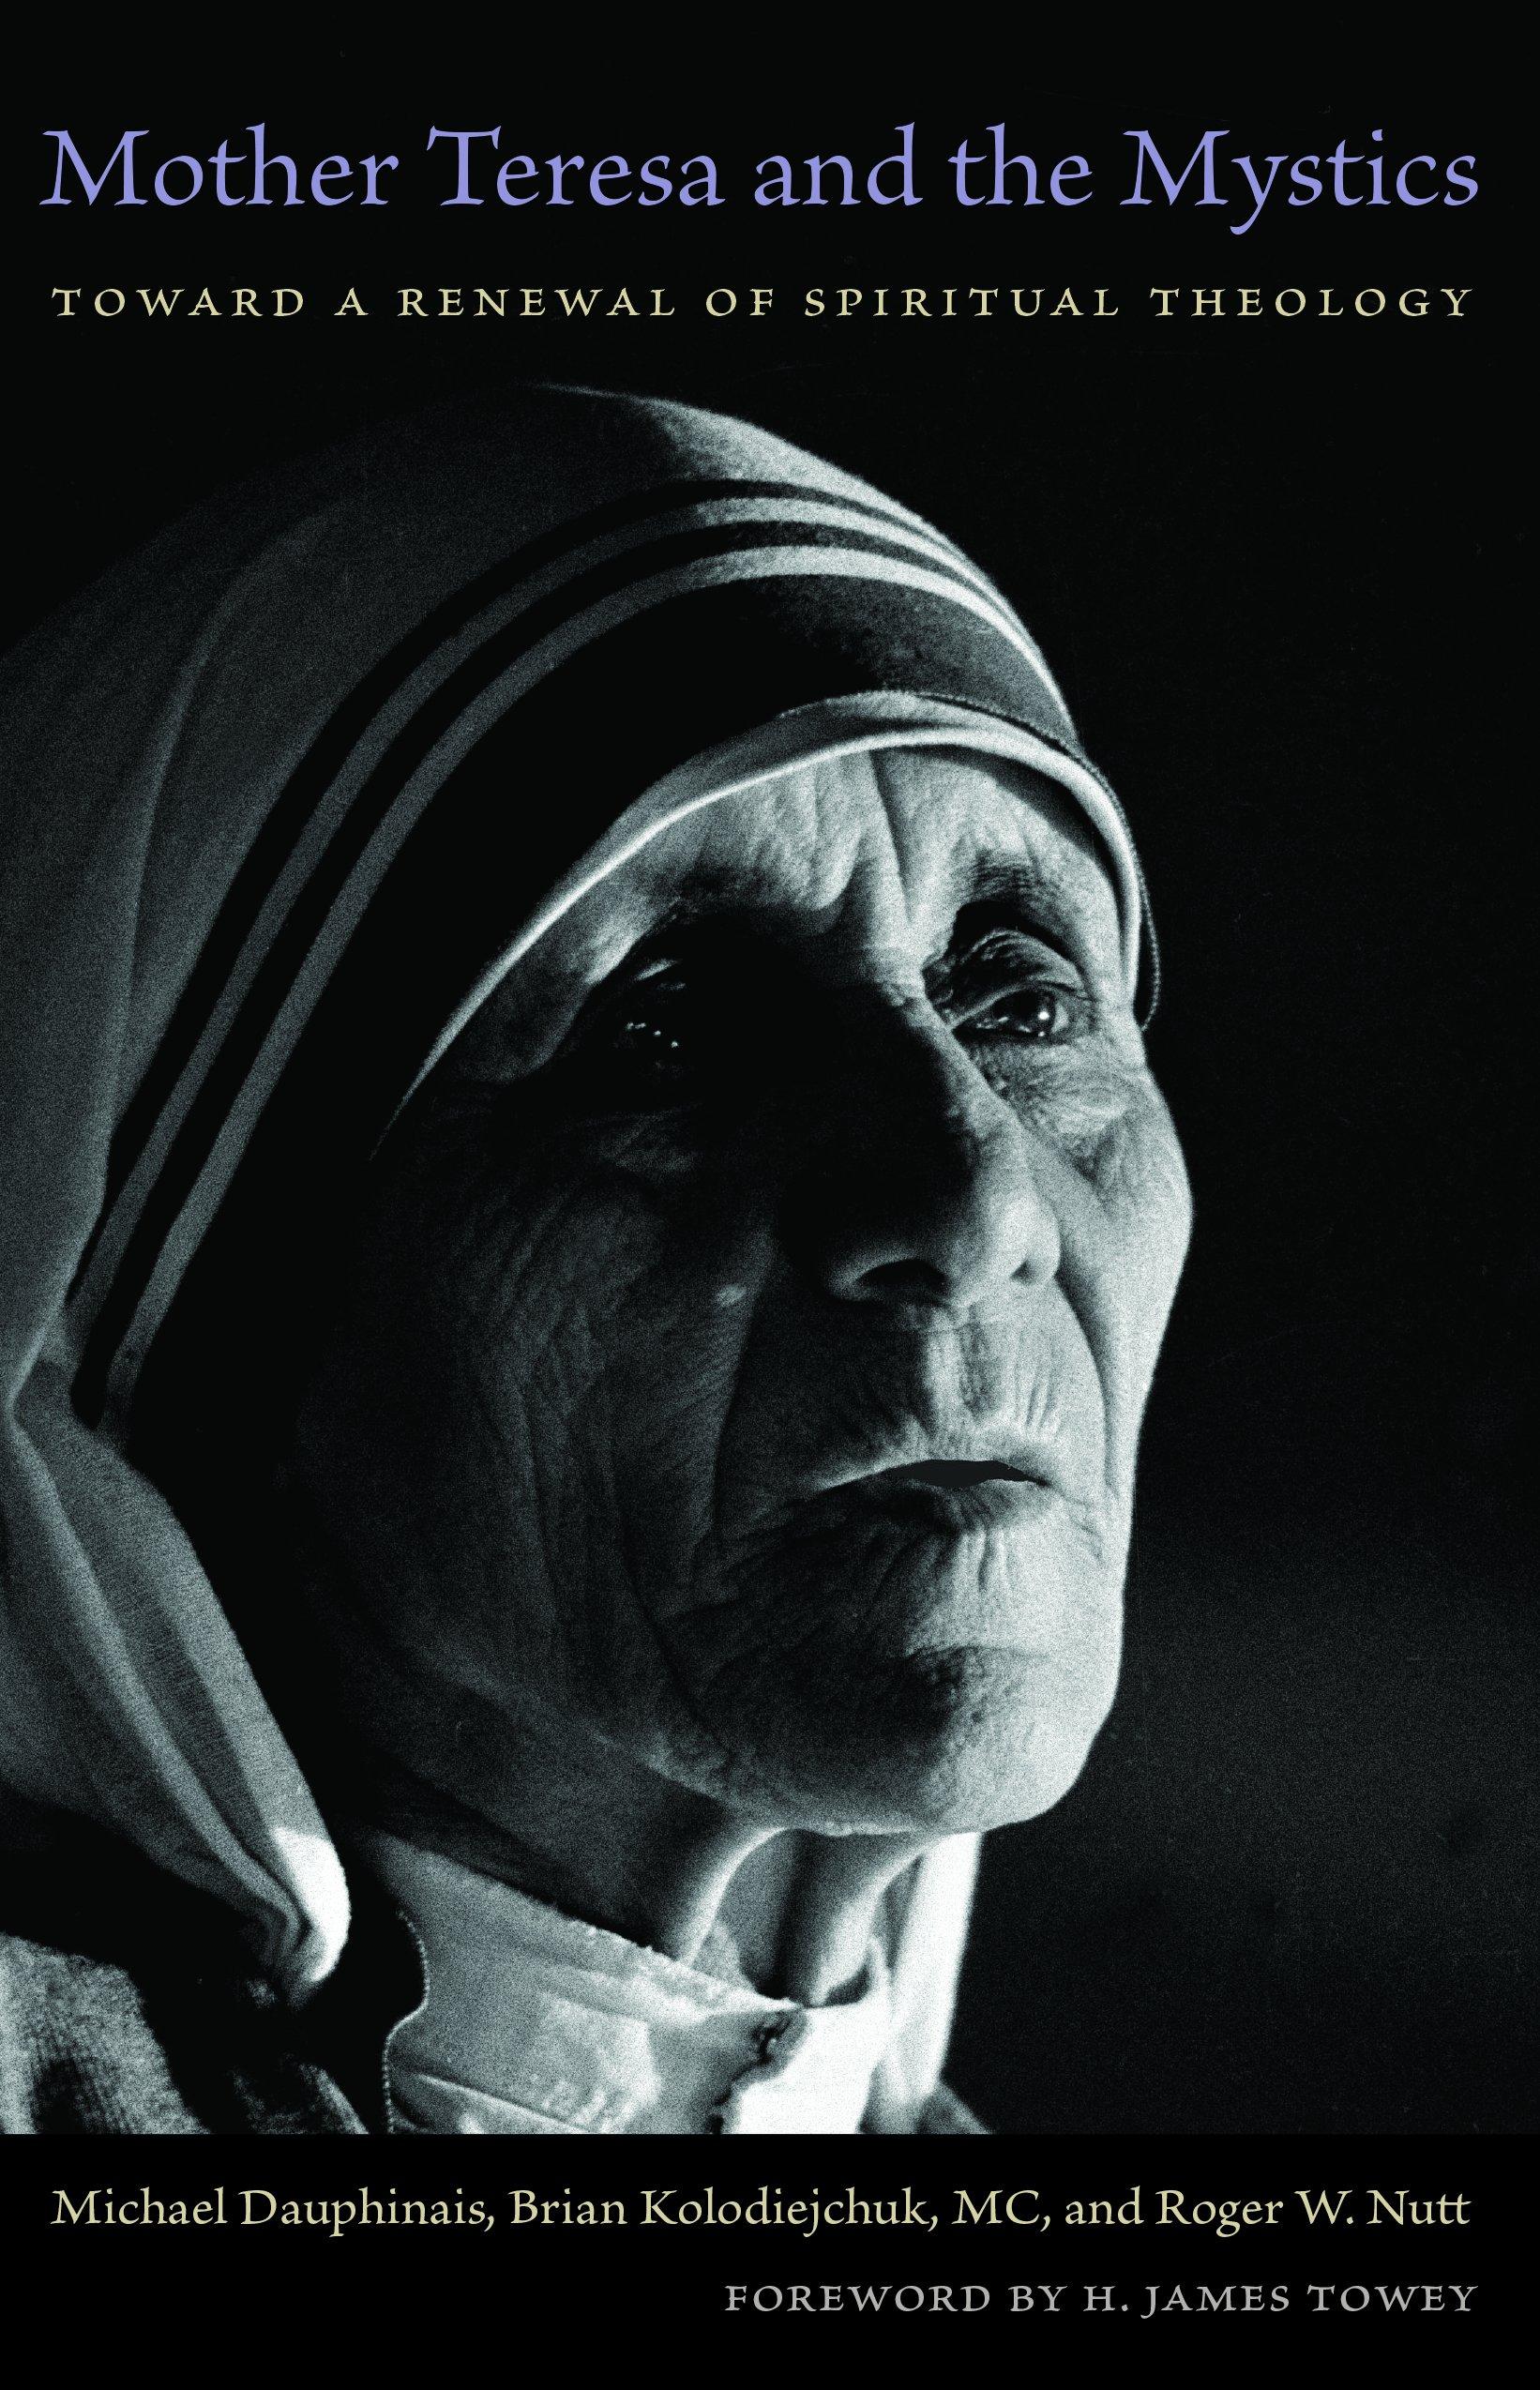 Download Mother Teresa and the Mystics: Toward a Renewal of Spiritual Theology PDF